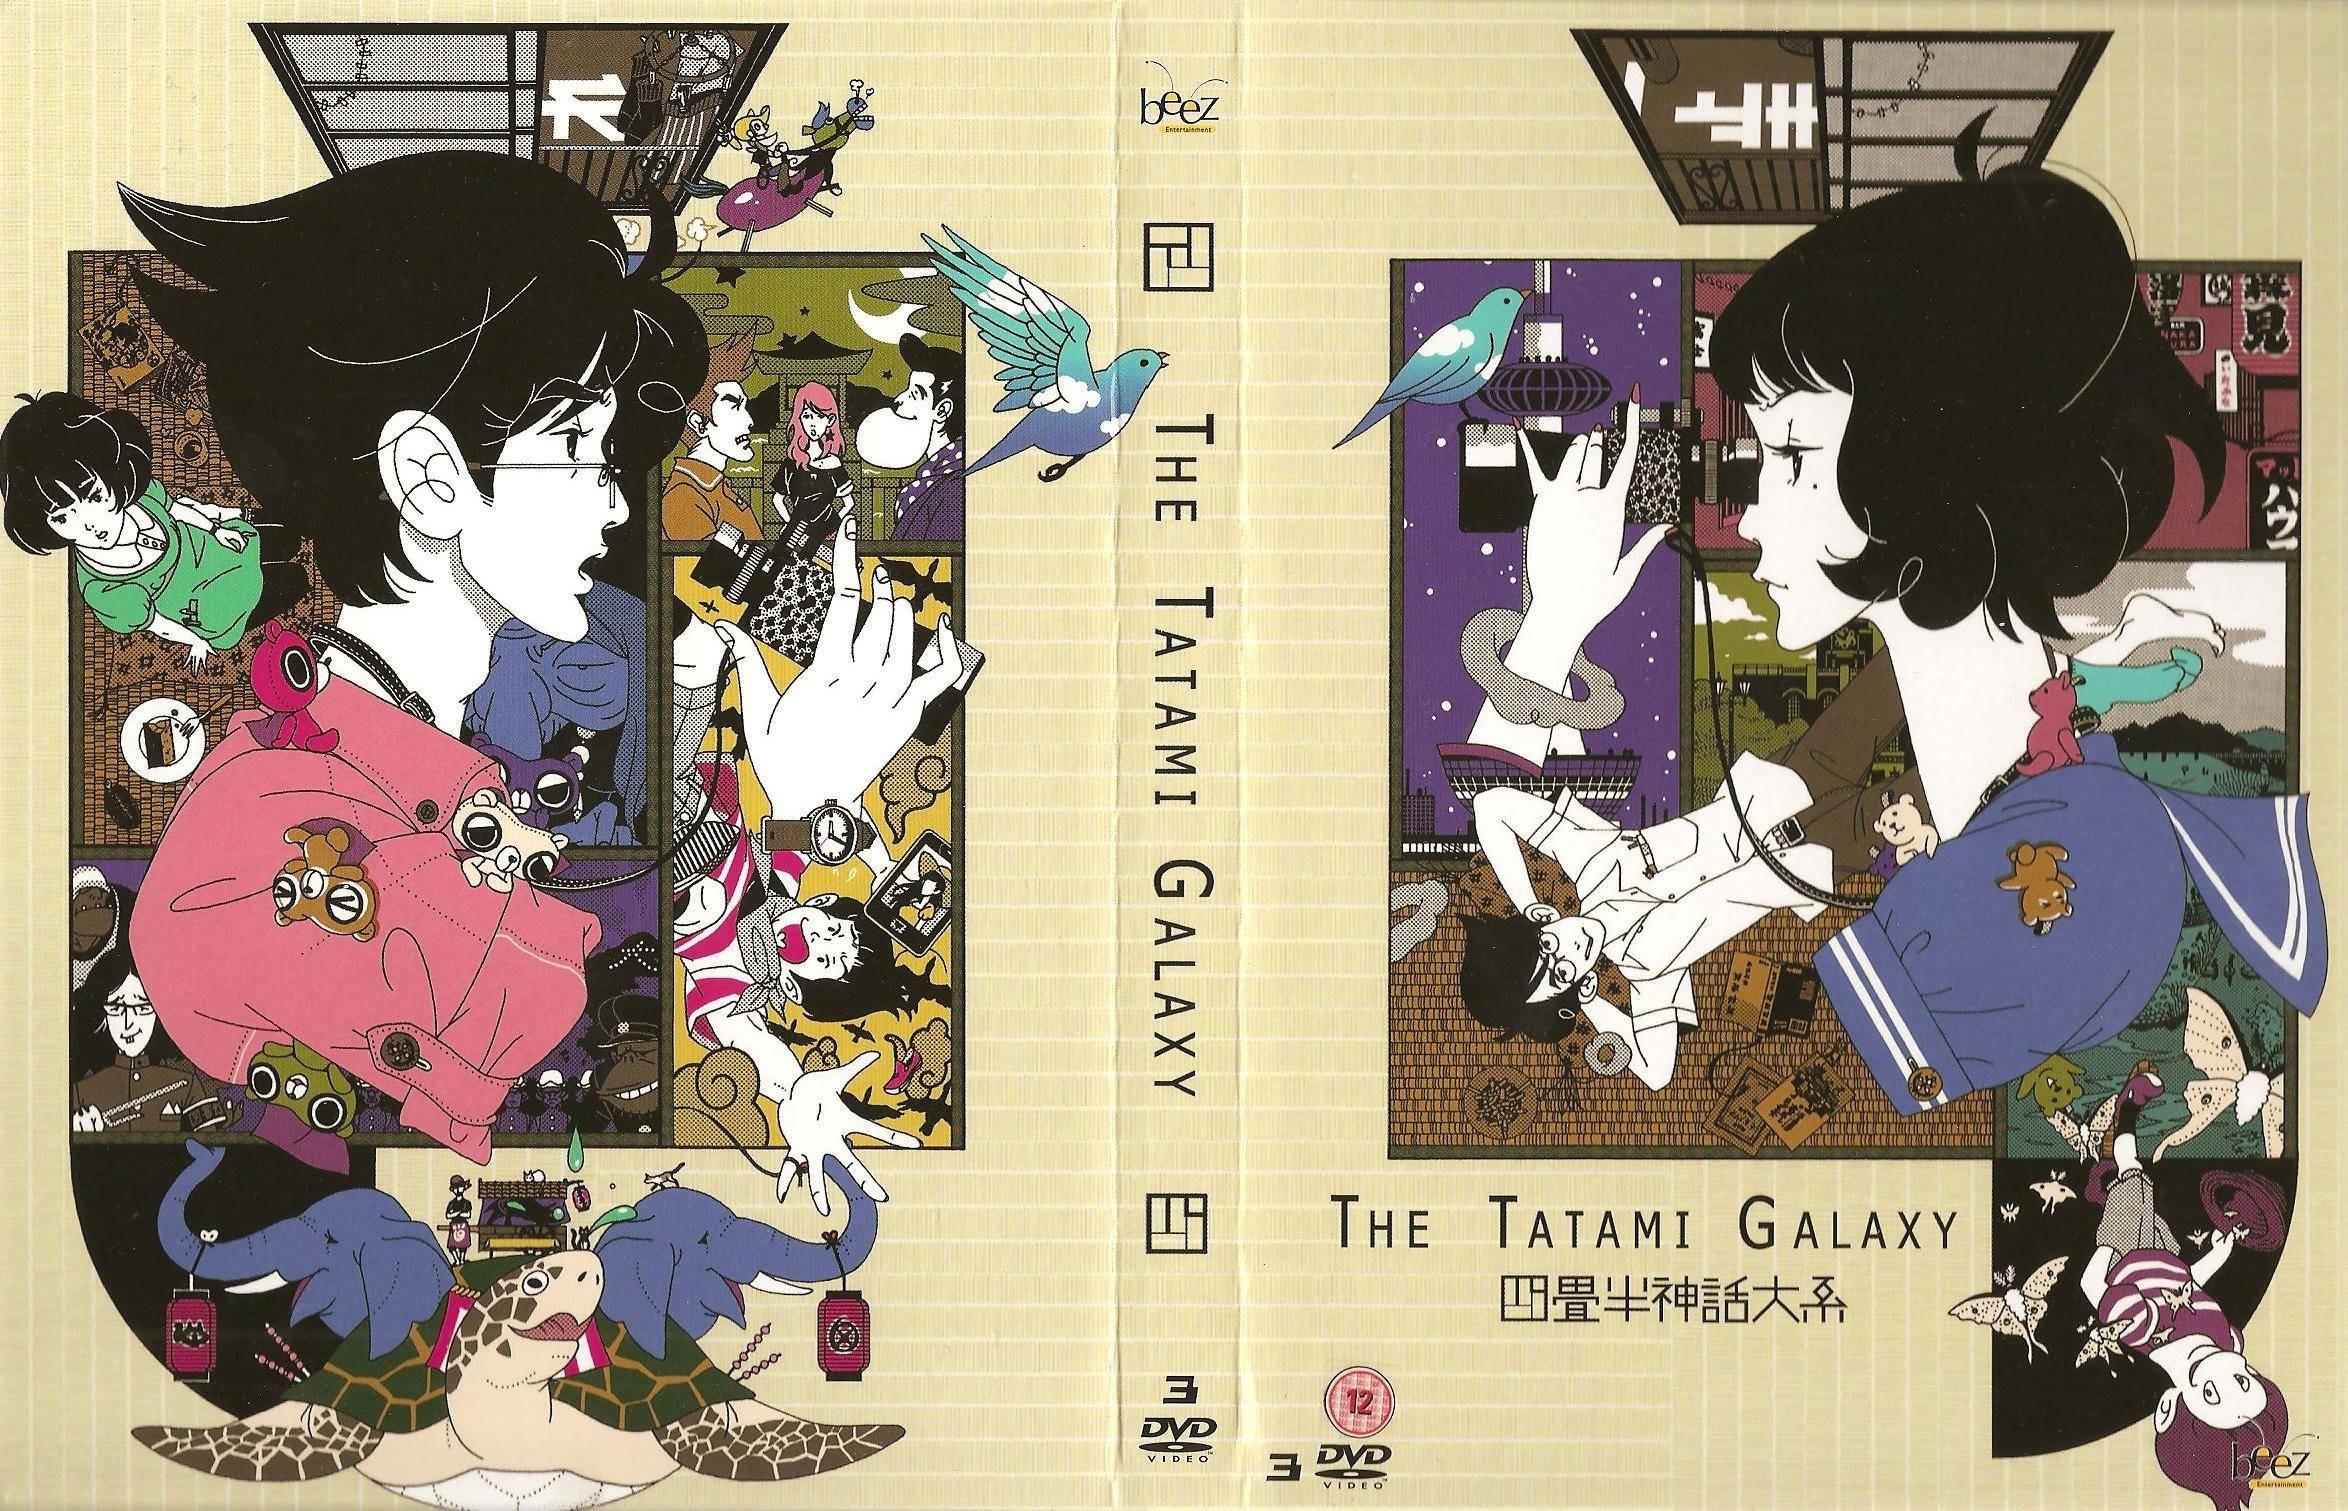 I adore the Tatami Galaxy …